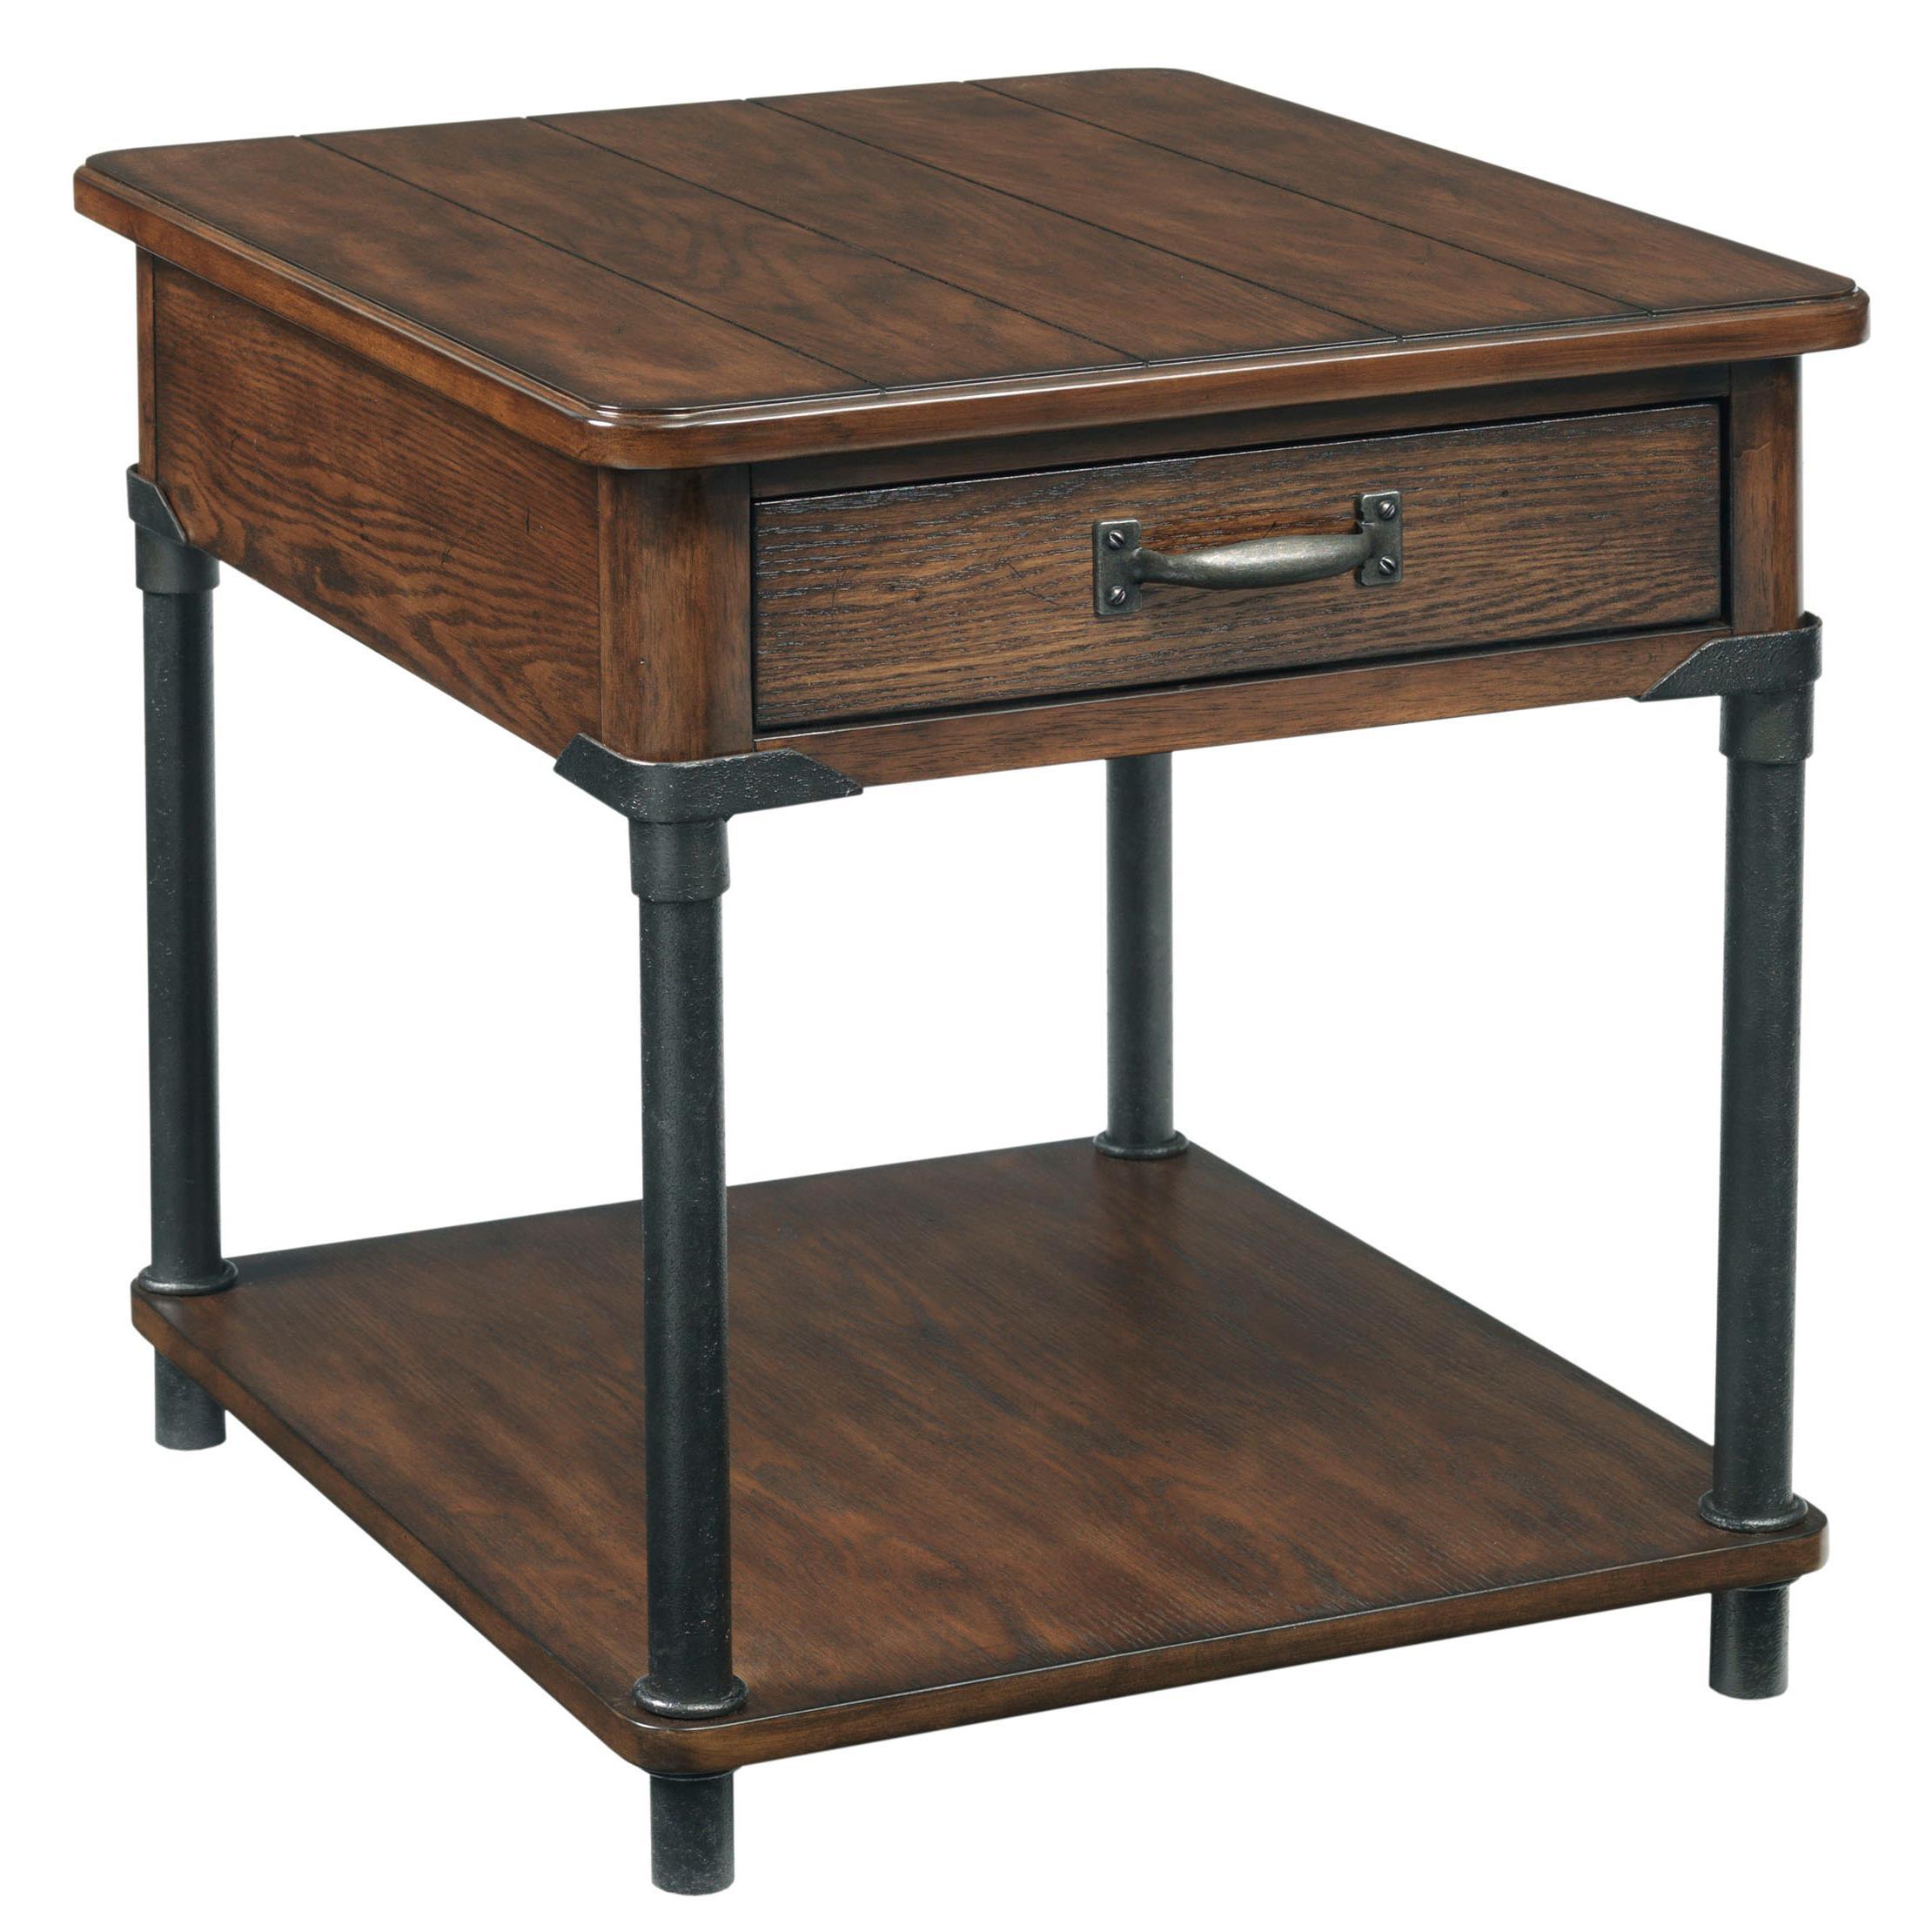 Broyhill Furniture Saluda Drawer End Table - Item Number: 3353-002